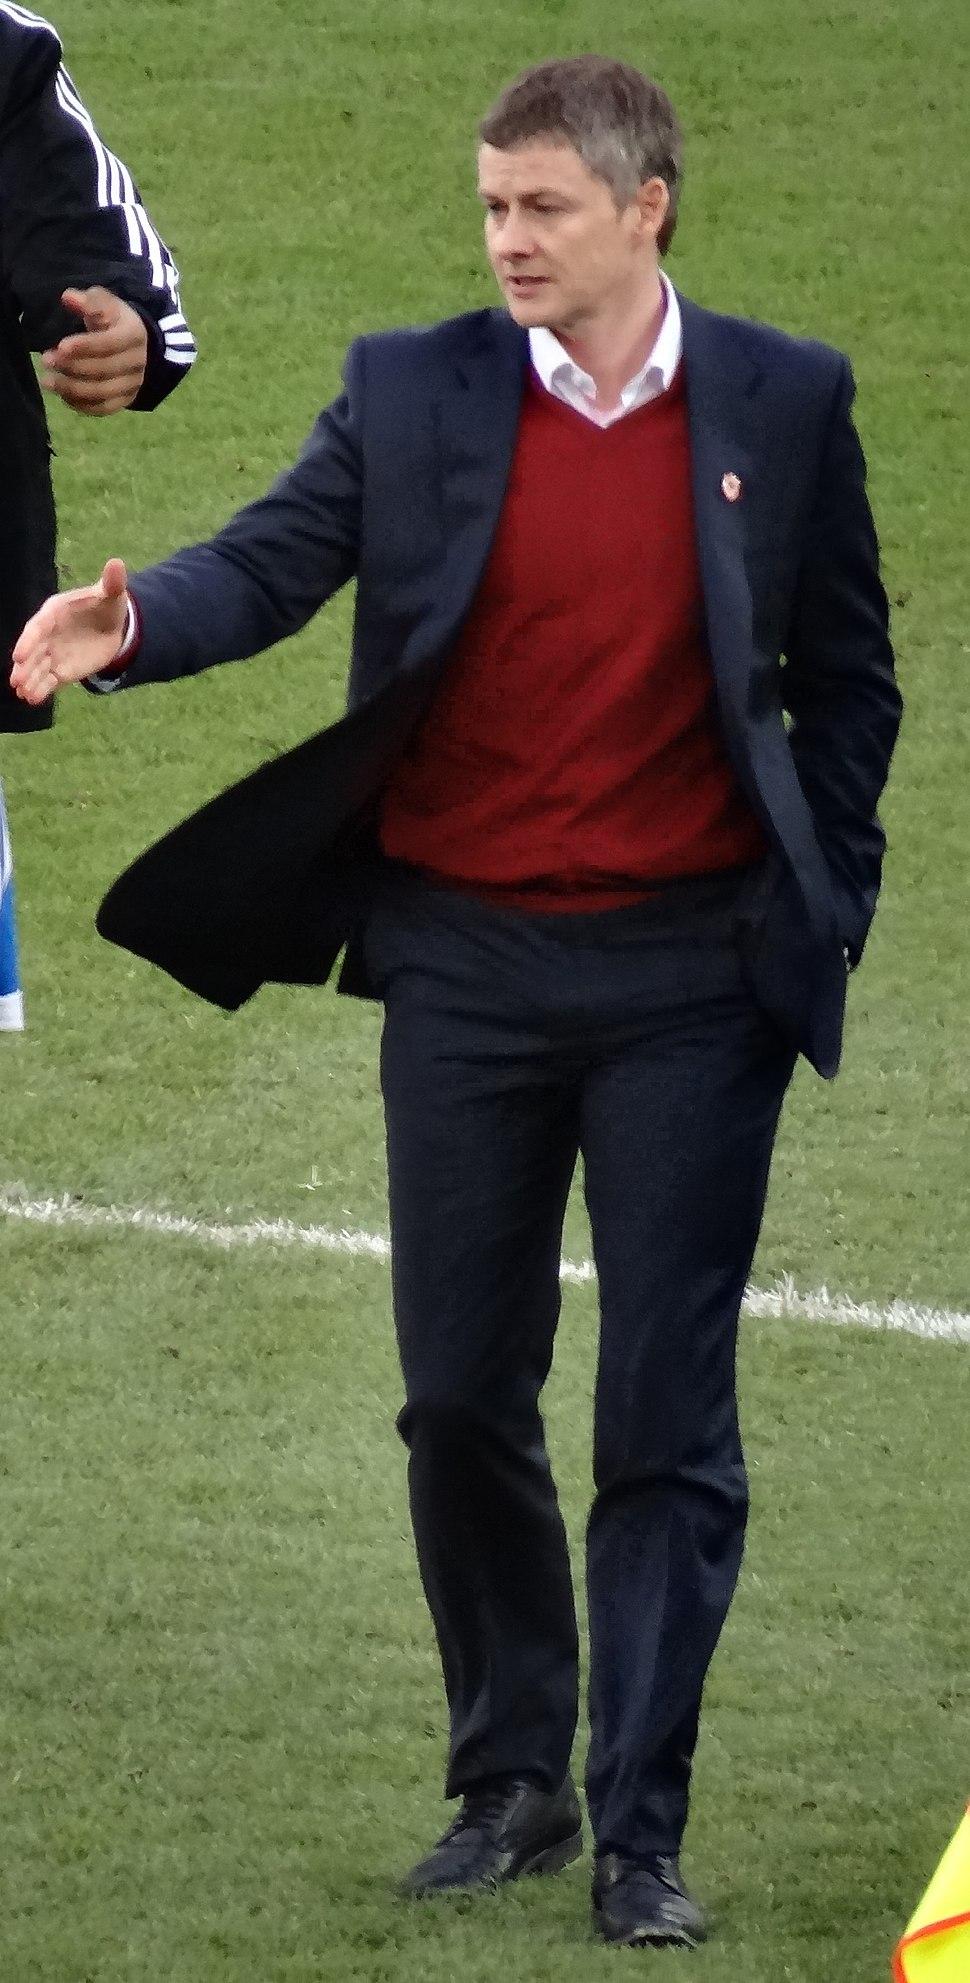 Ole Gunnar Solskjaer Cardiff manager cropped